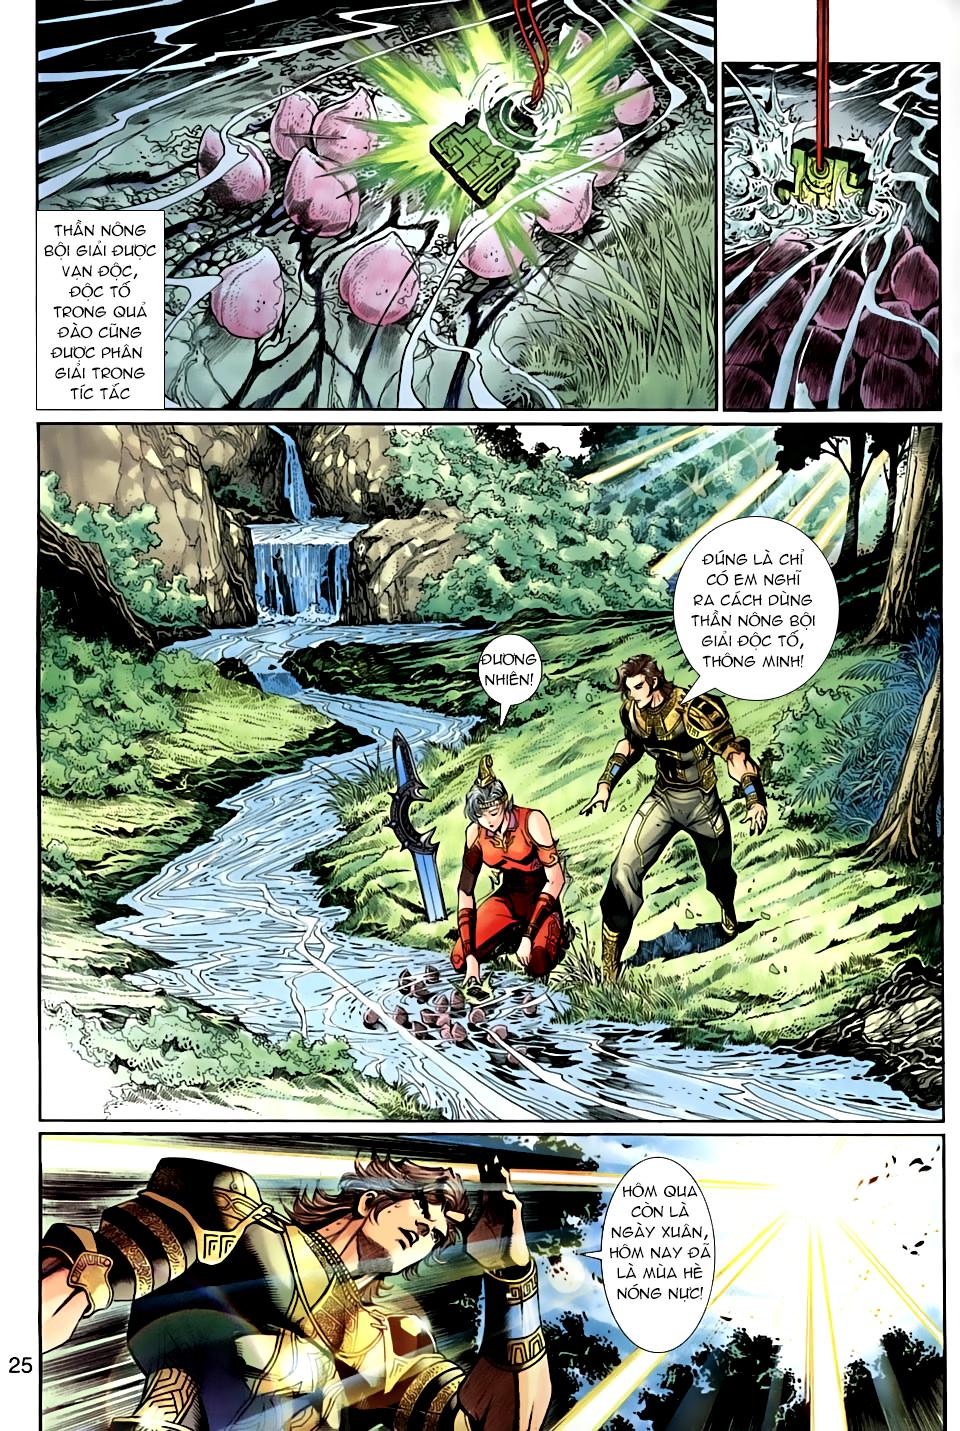 Thần binh huyền kỳ 3 - 3.5 Chapter 83 - Hamtruyen.vn